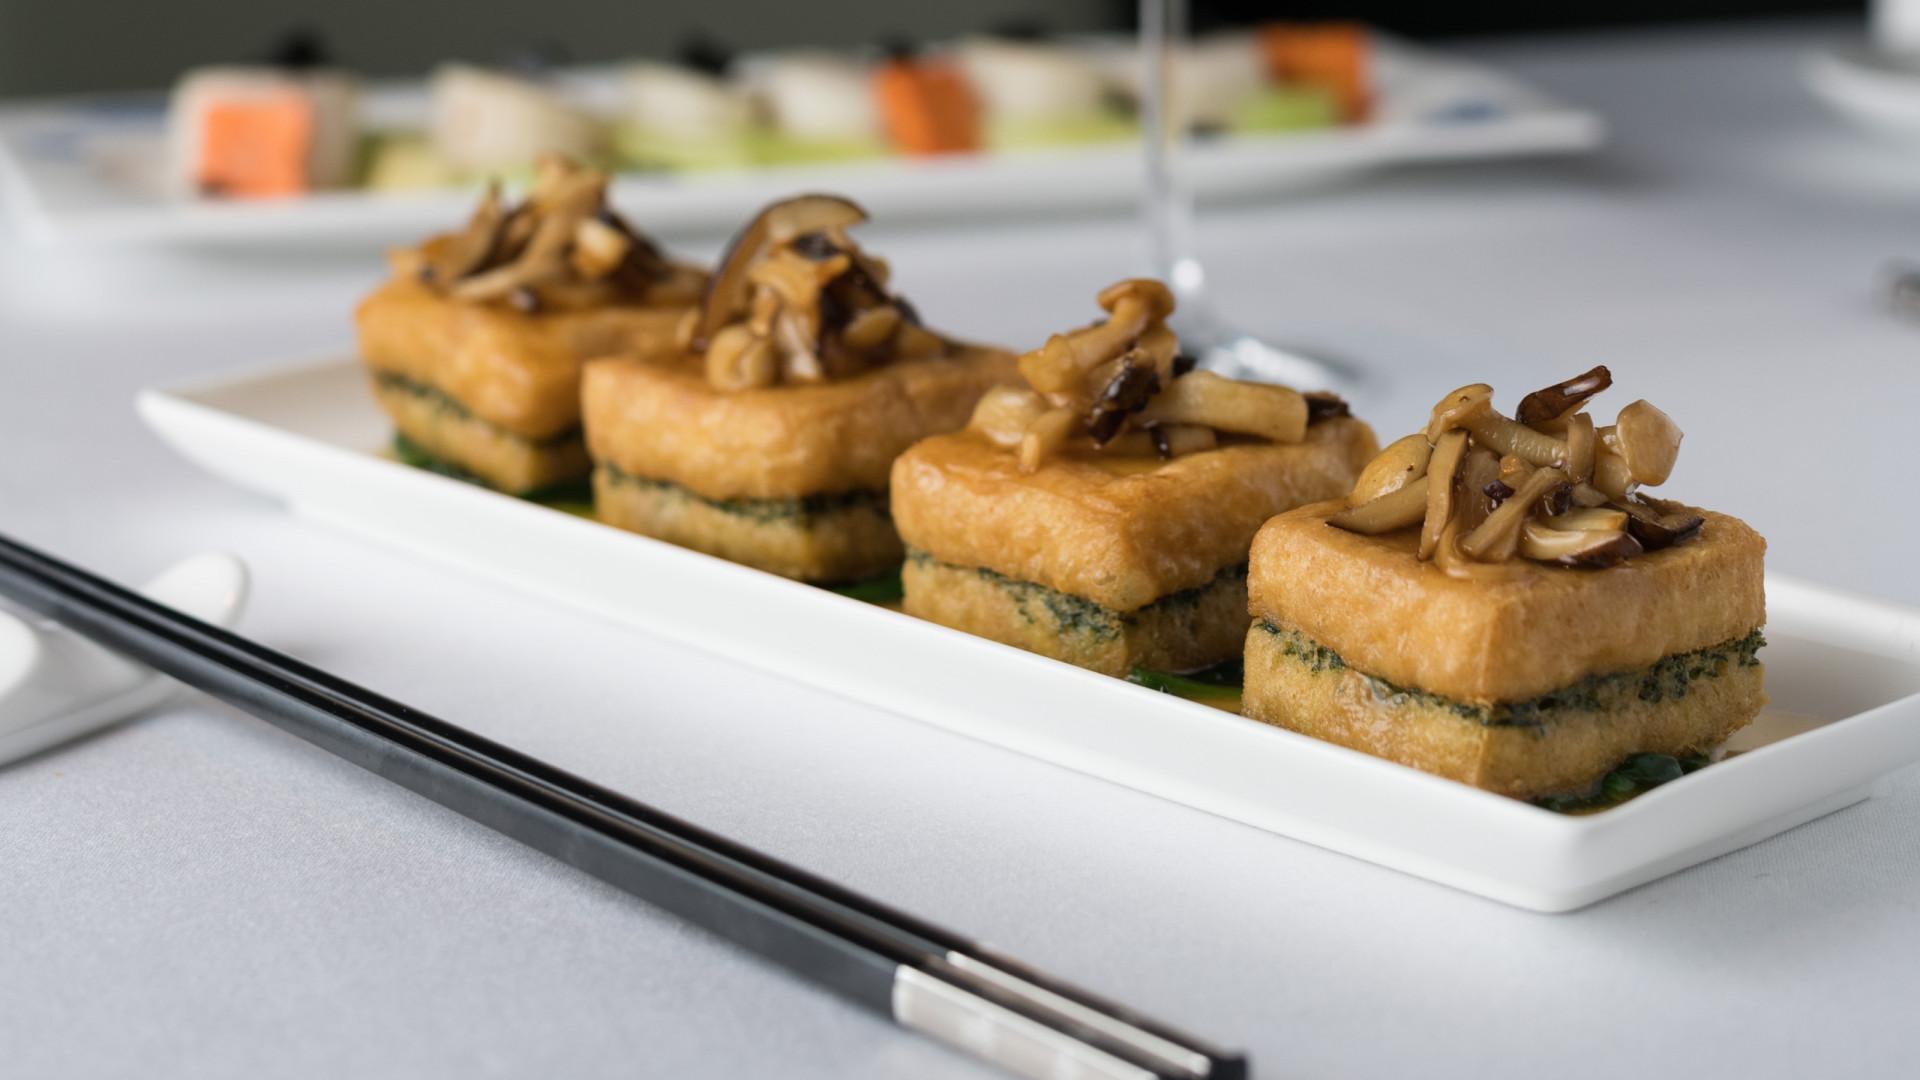 Braised spinach tofu with mushrooms